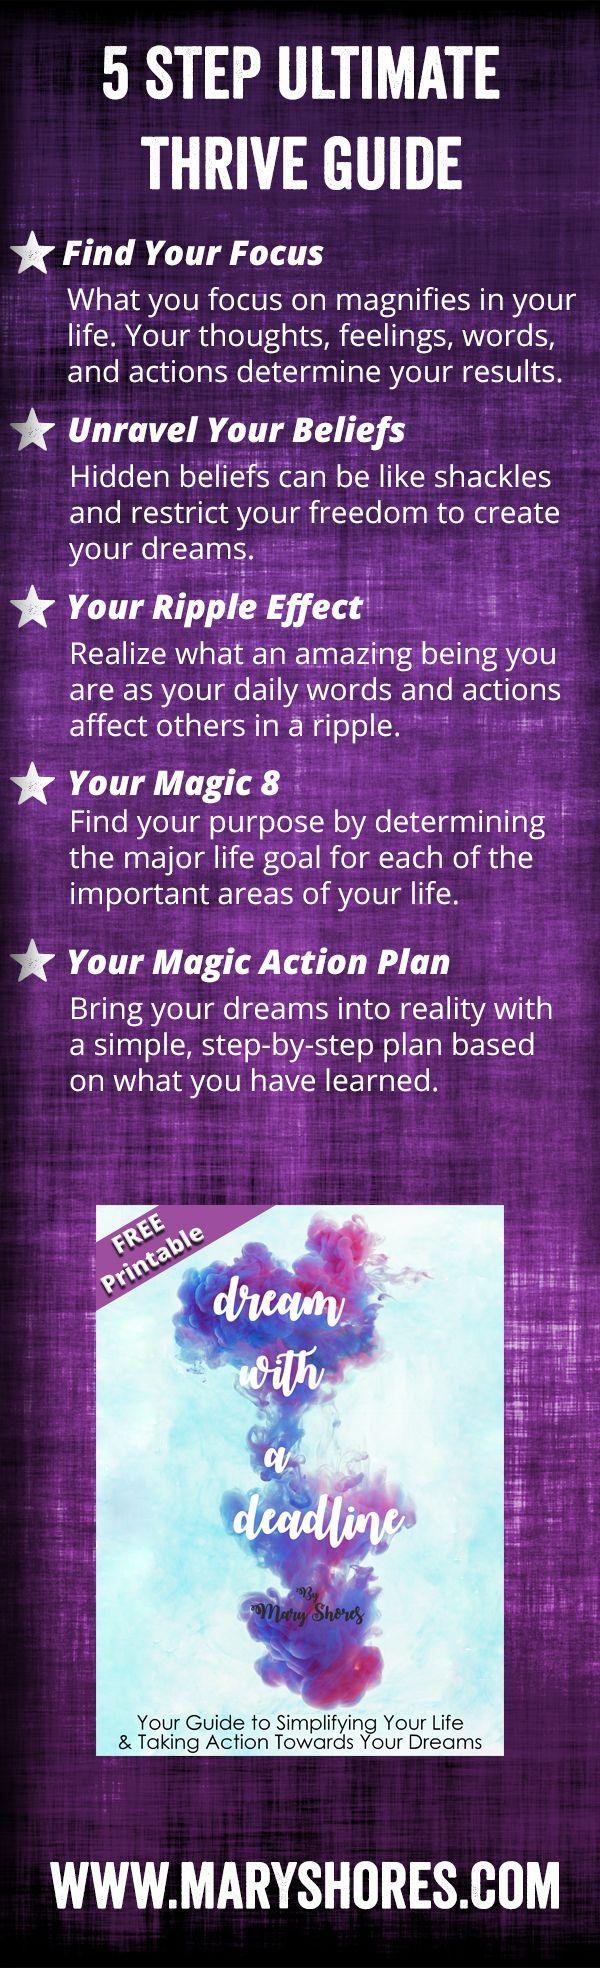 FREE PRINTABLE Ultimate Thrive Guide Workbook